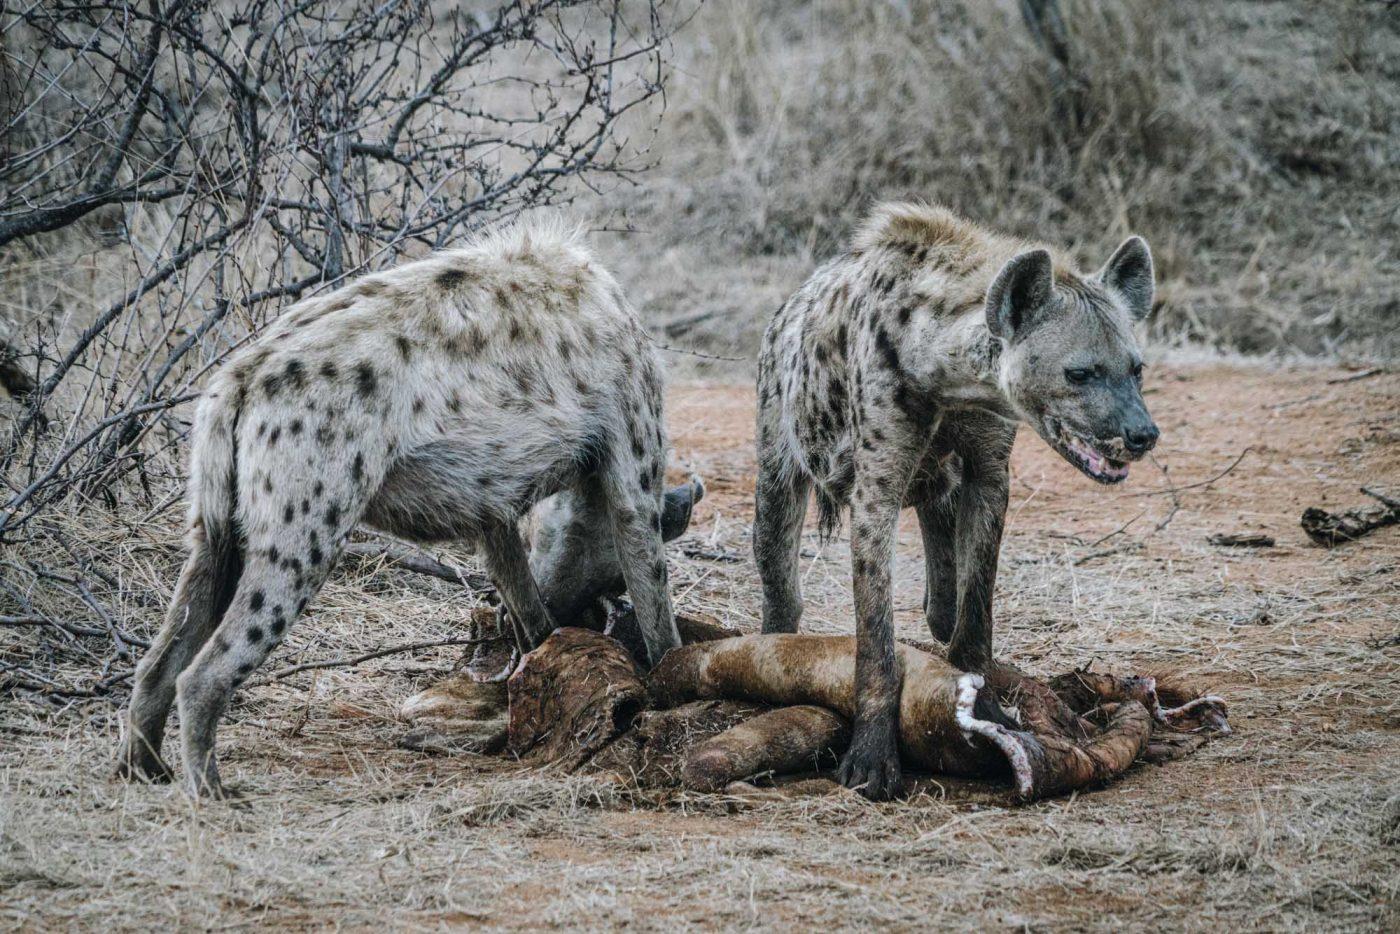 Hyenas crunching on giraffe kill after the lions had left